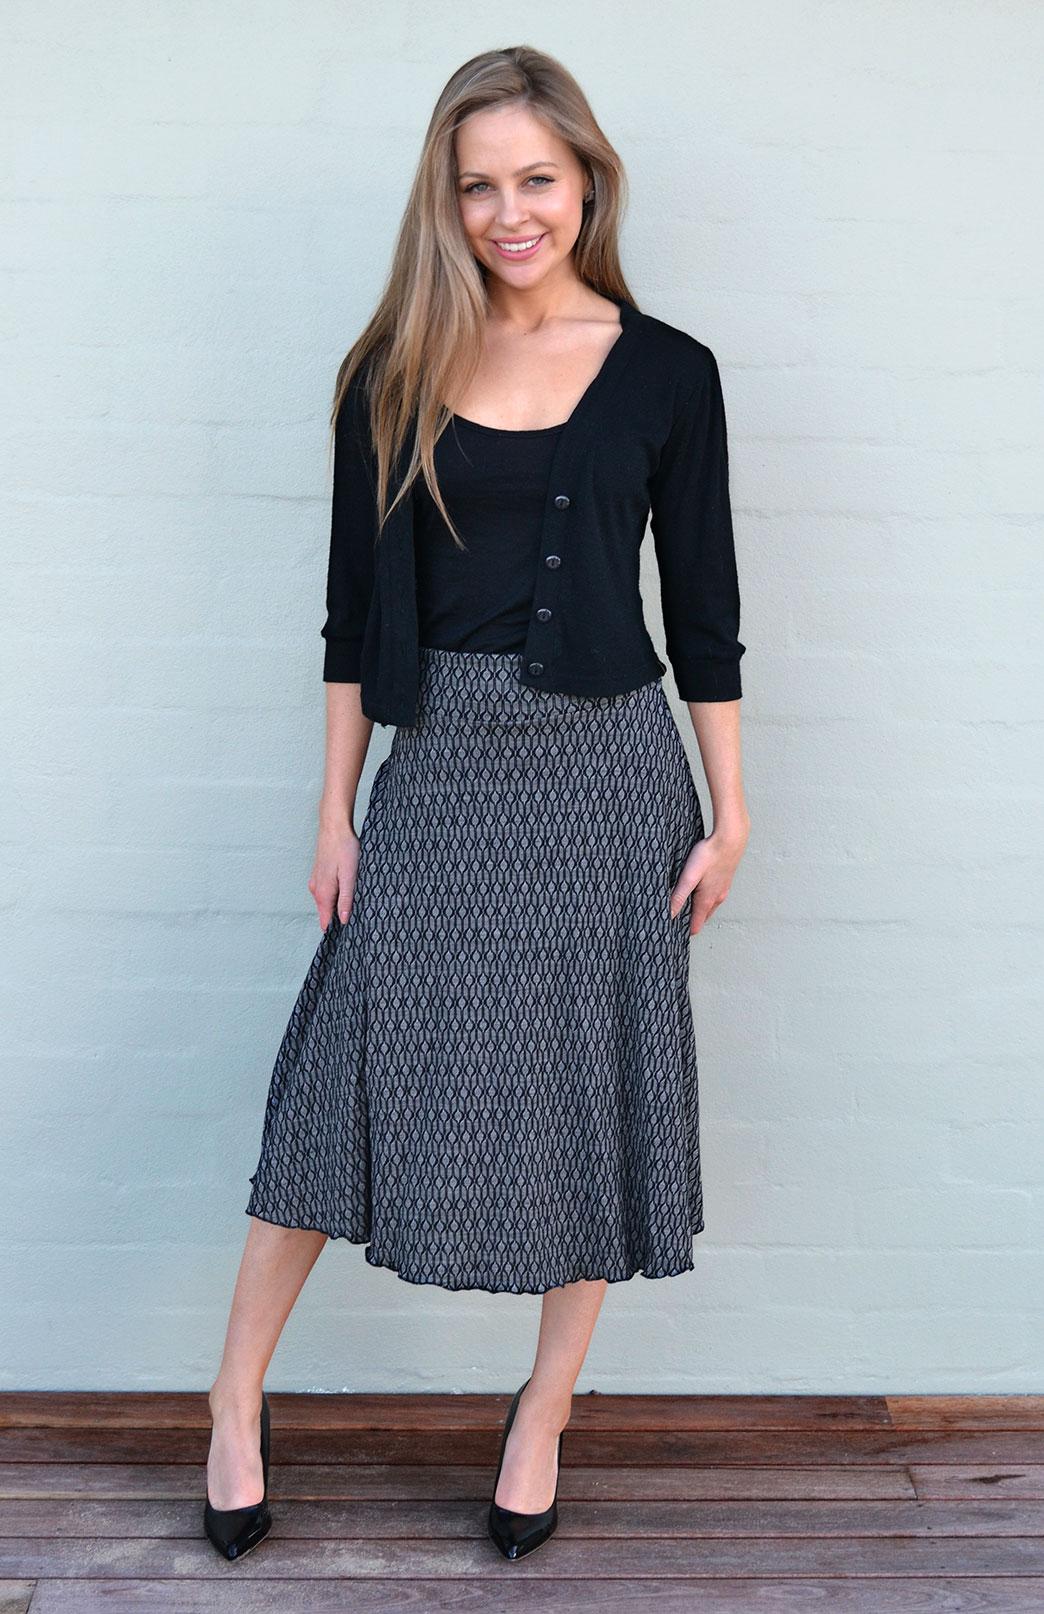 Twirl Skirt - Women's Black Keyhole A-Line Swing Wool Skirt - Smitten Merino Tasmania Australia